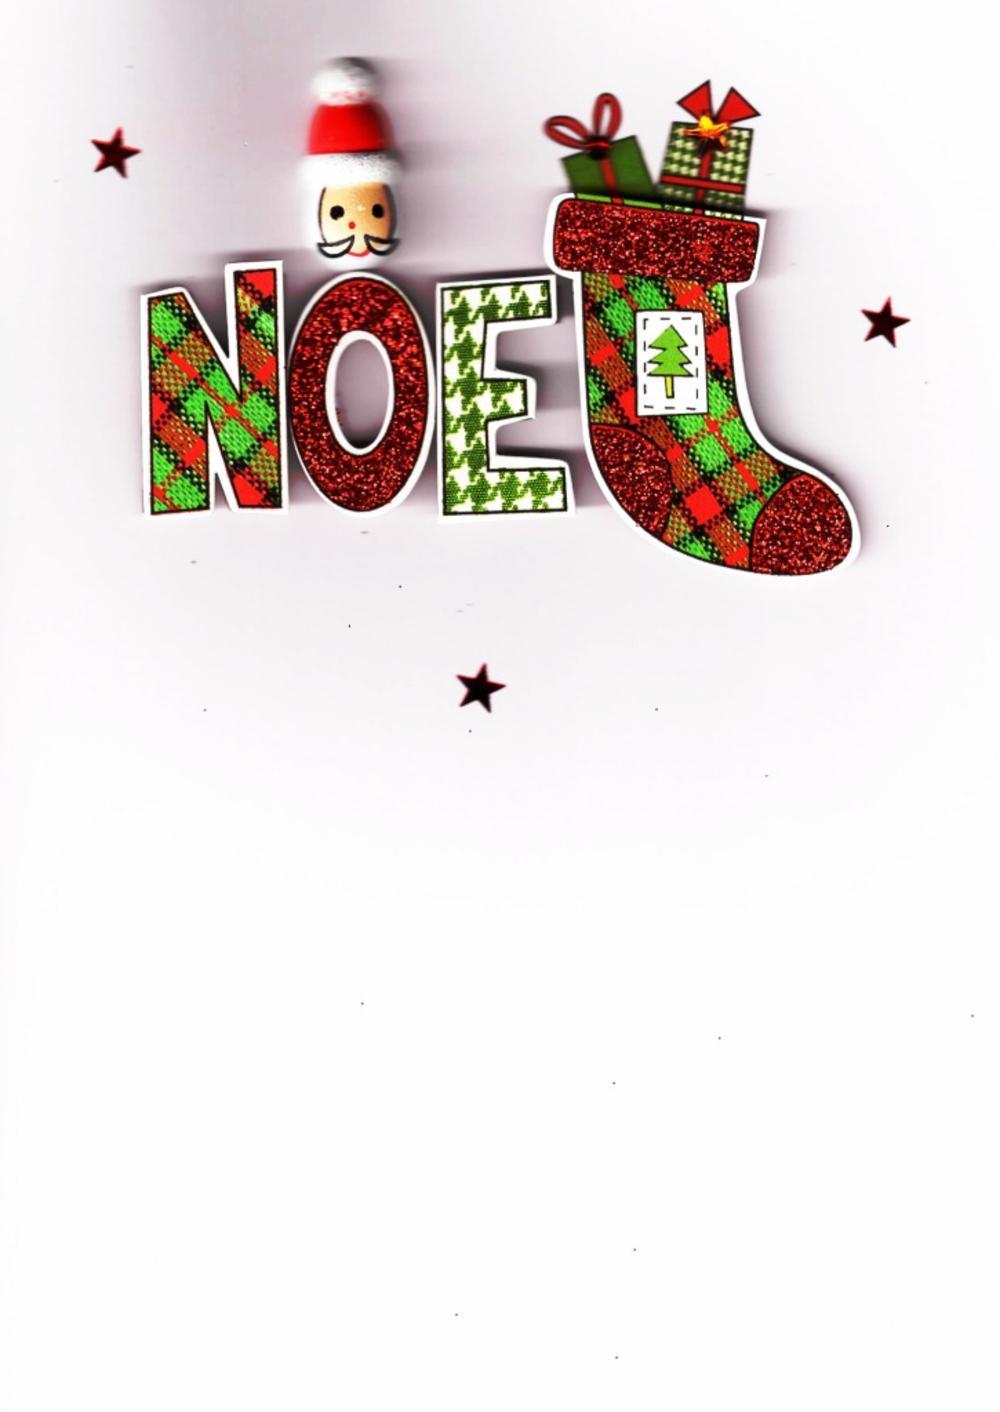 Noel Lovely Embellished Christmas Greeting Card